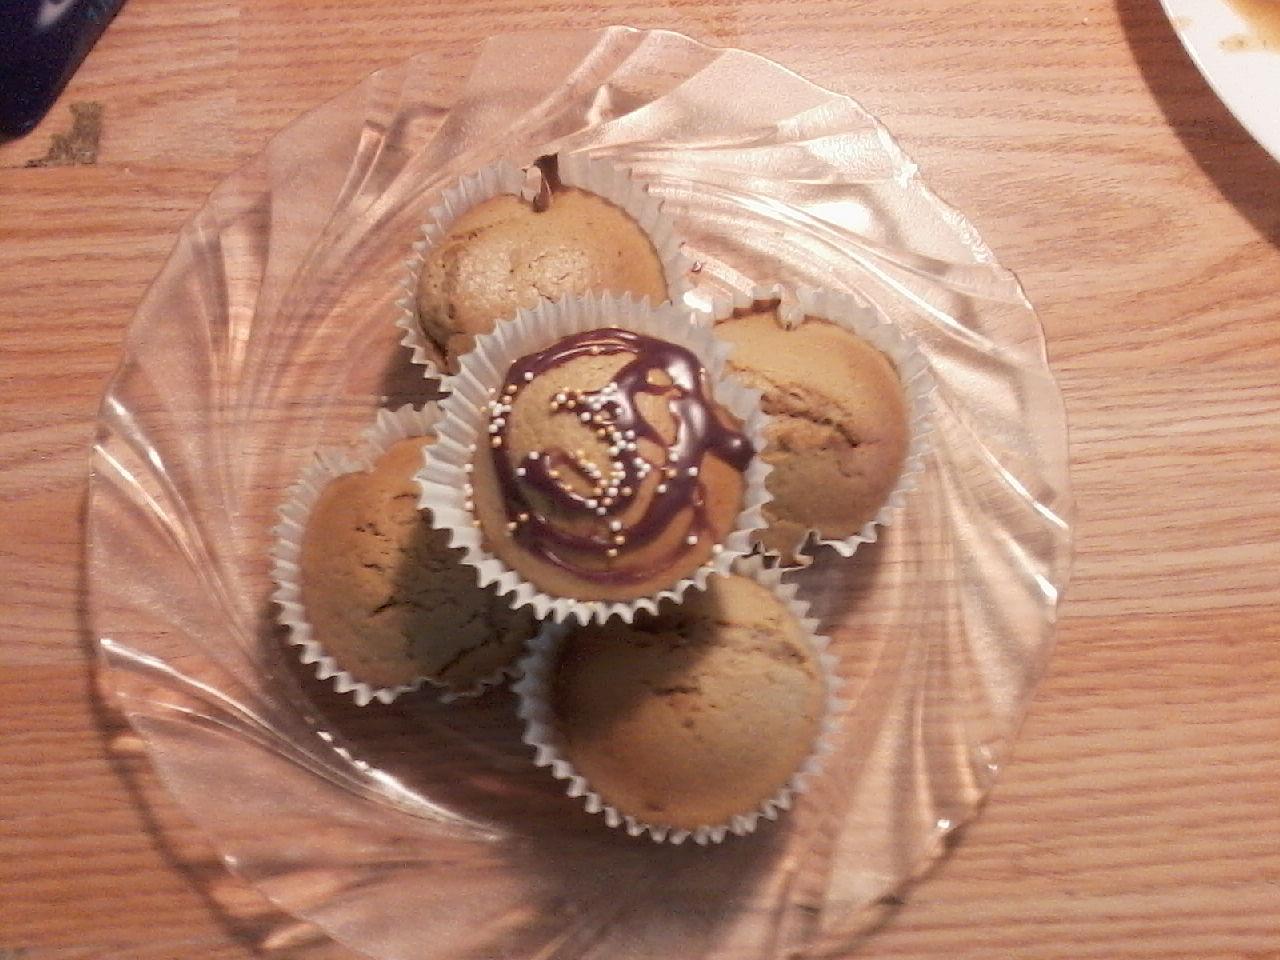 Muffiny capuccino